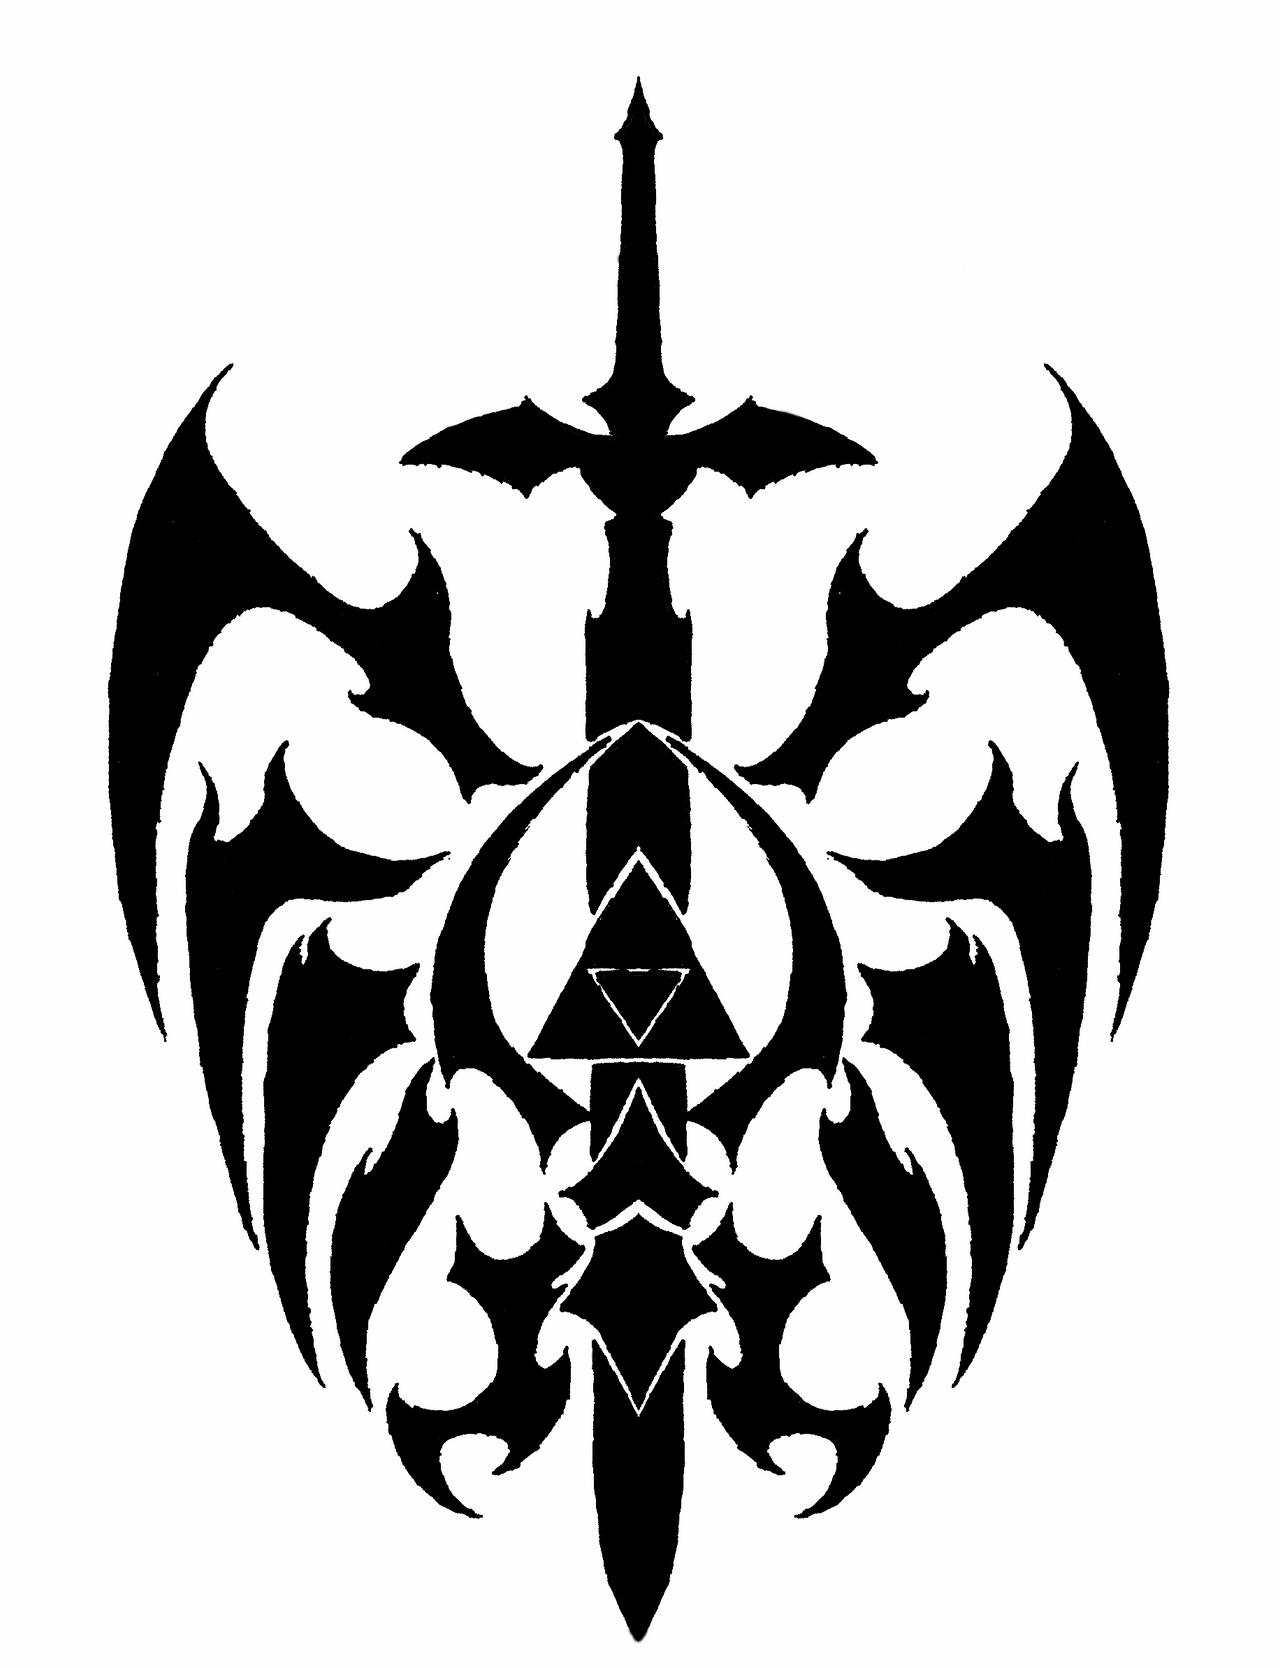 Triforce Drawing Triforce-thingy by atsuraelu